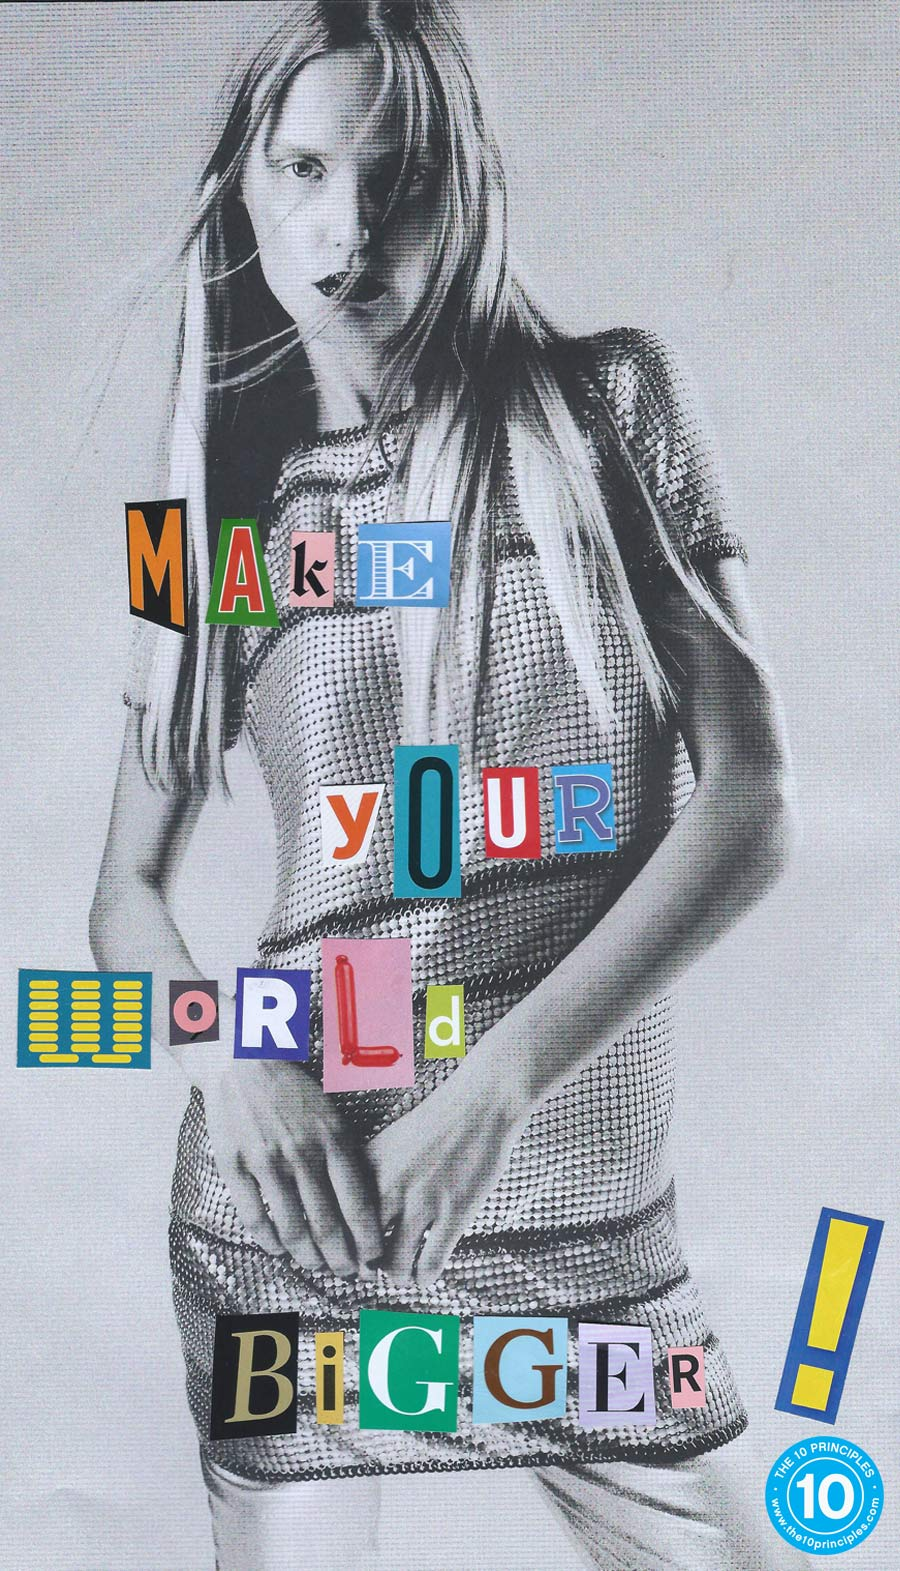 Make your world bigger